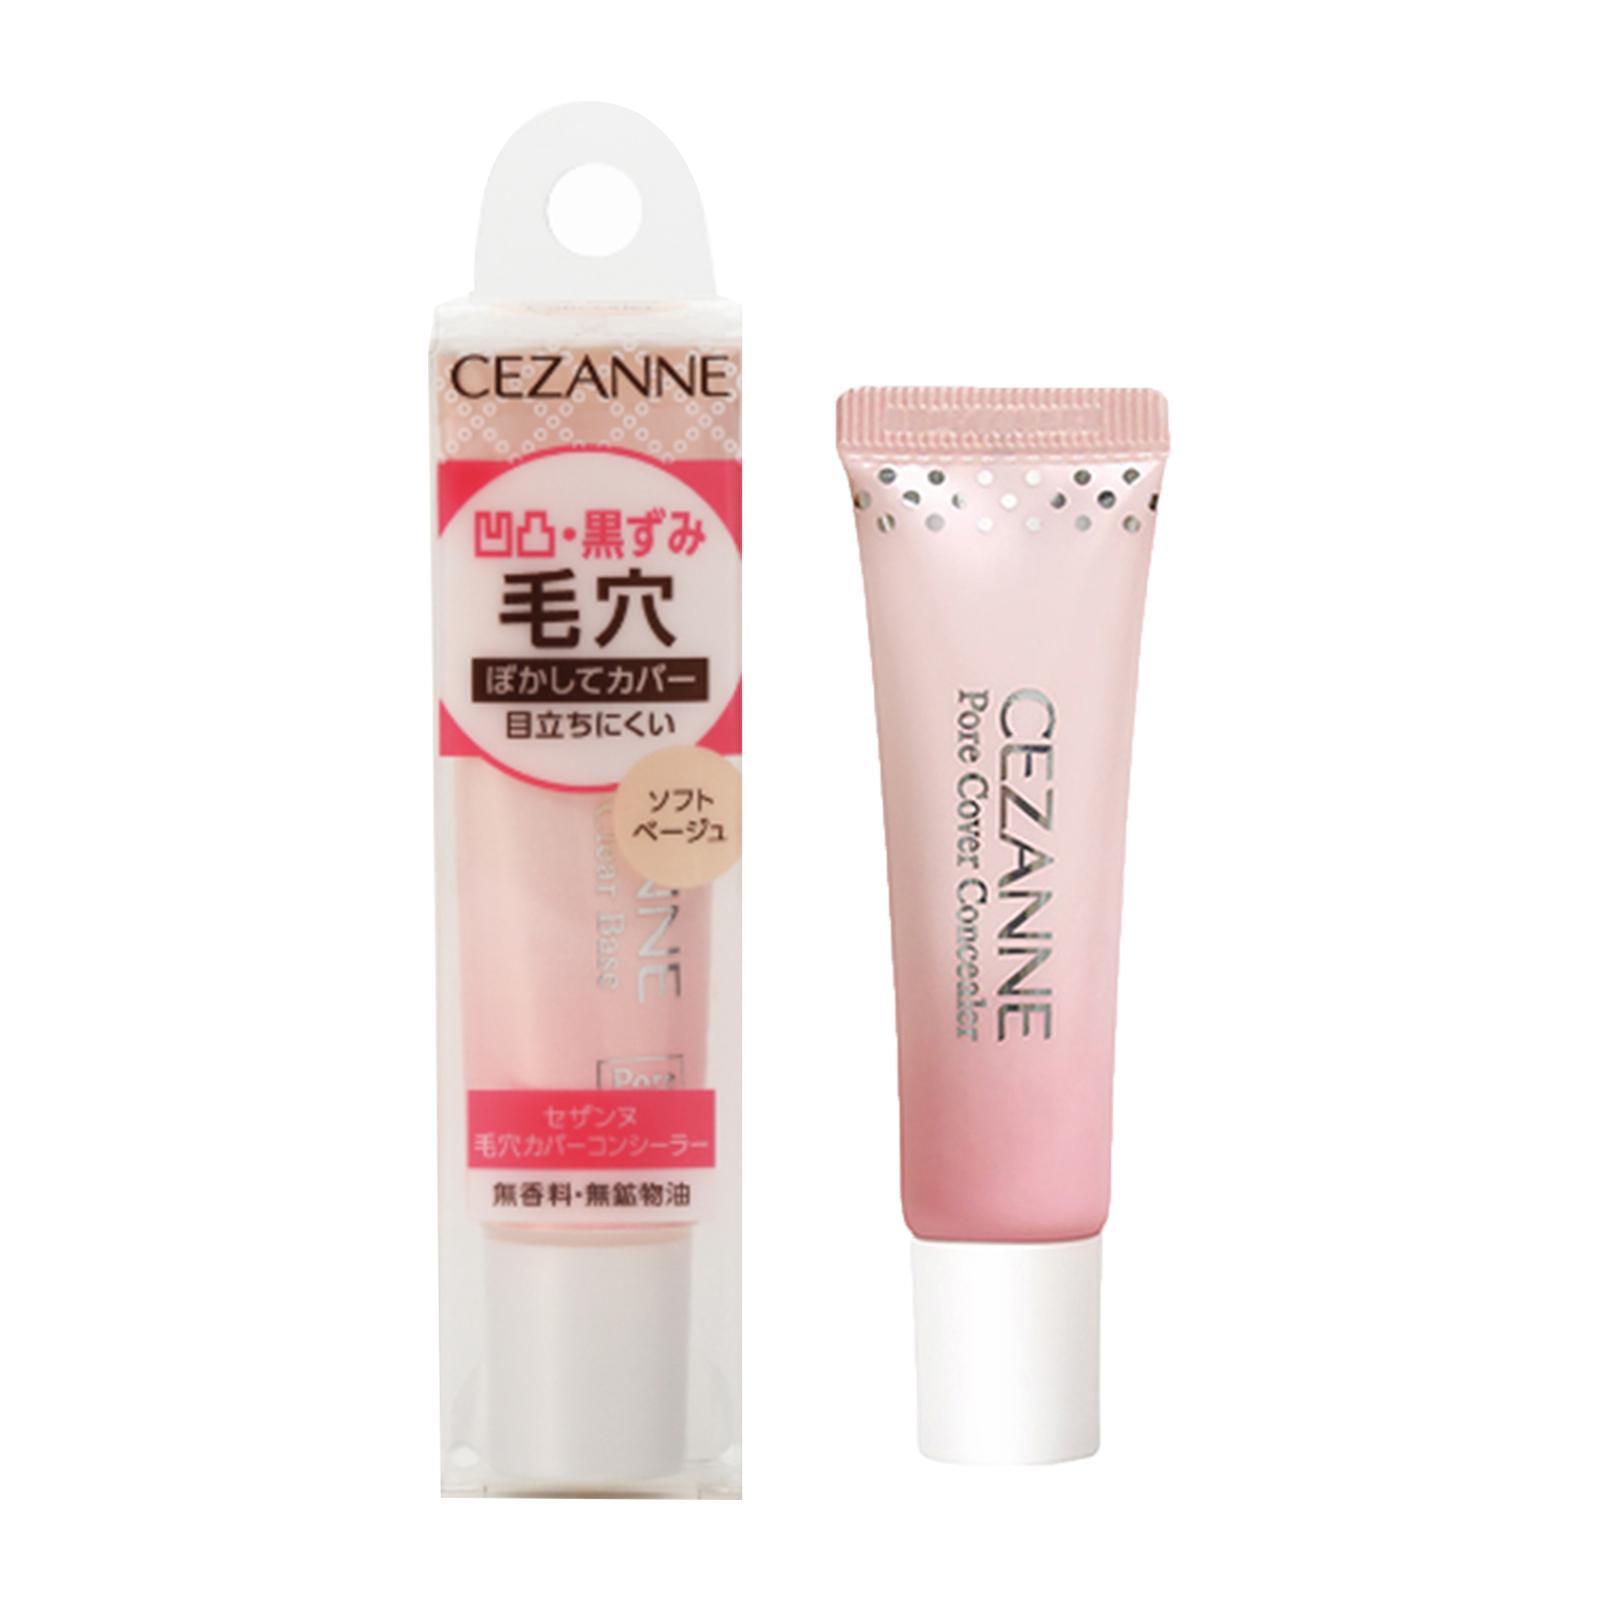 Cezanne Pore Cover Concealer